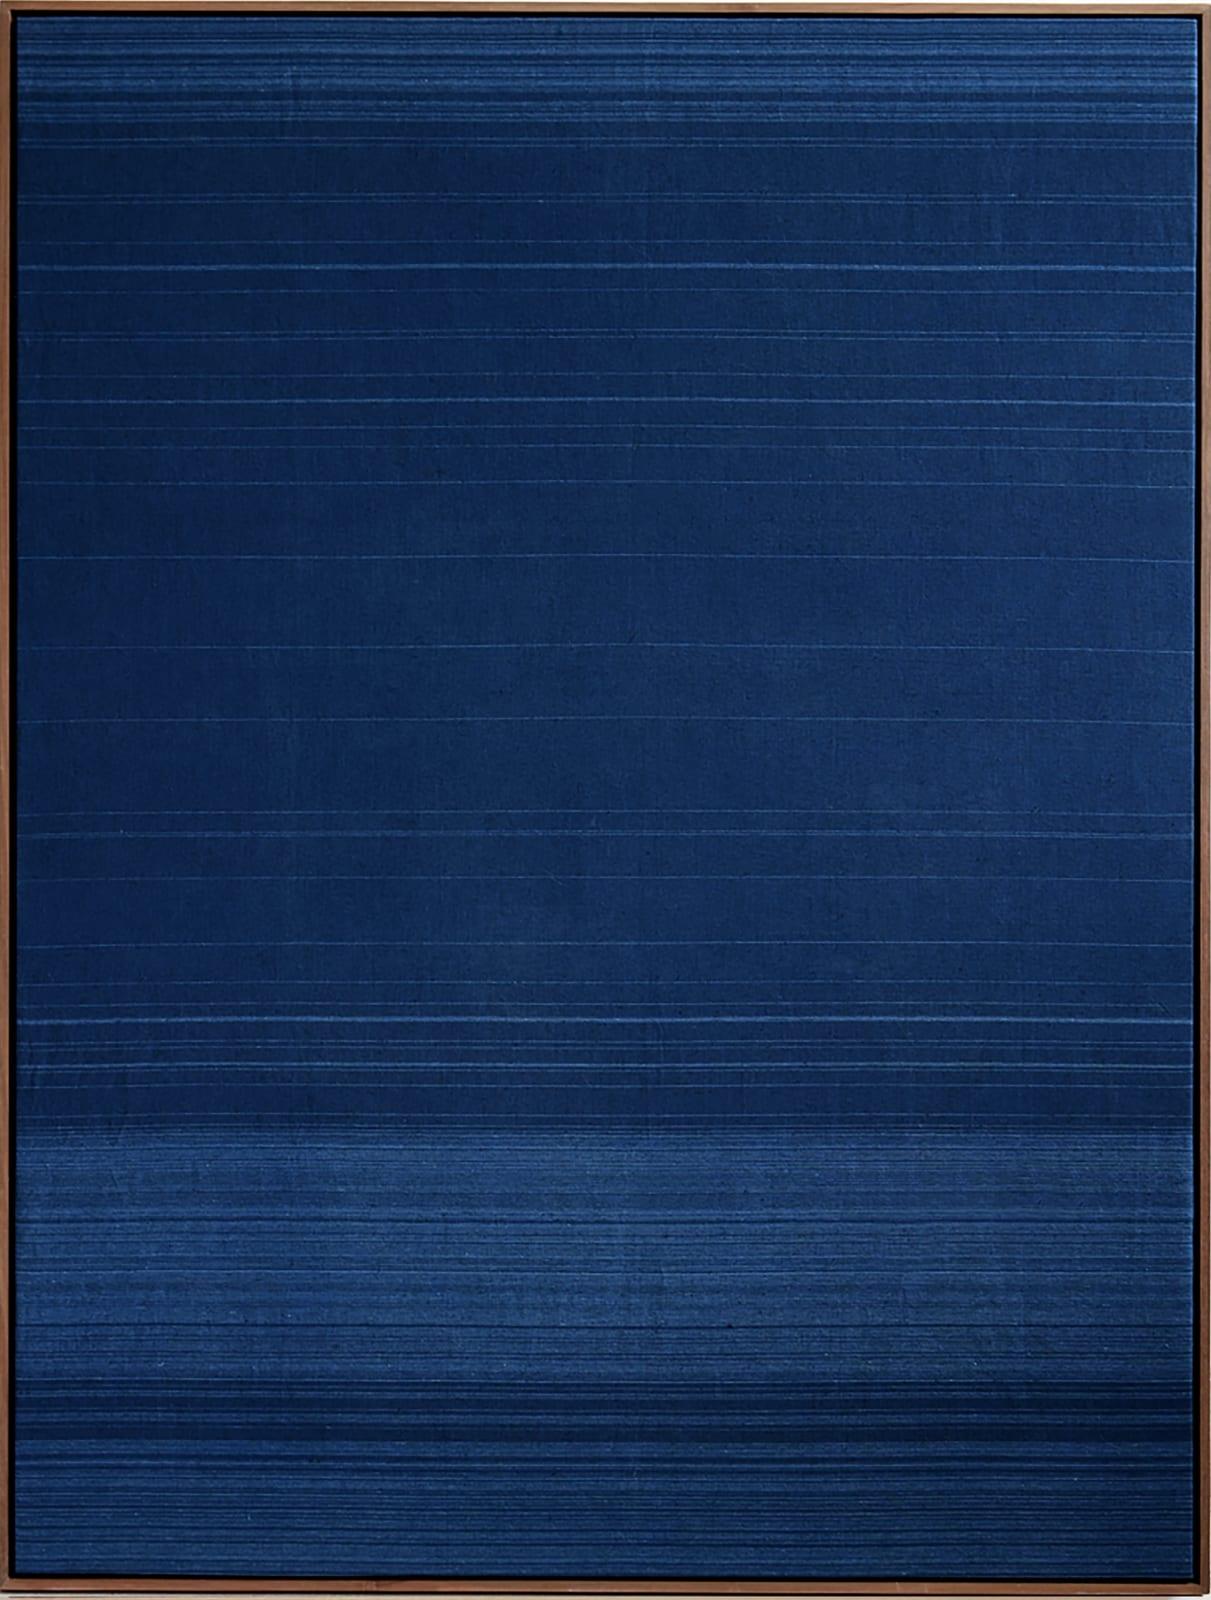 Alexander Sebastian, M'biru, 2020